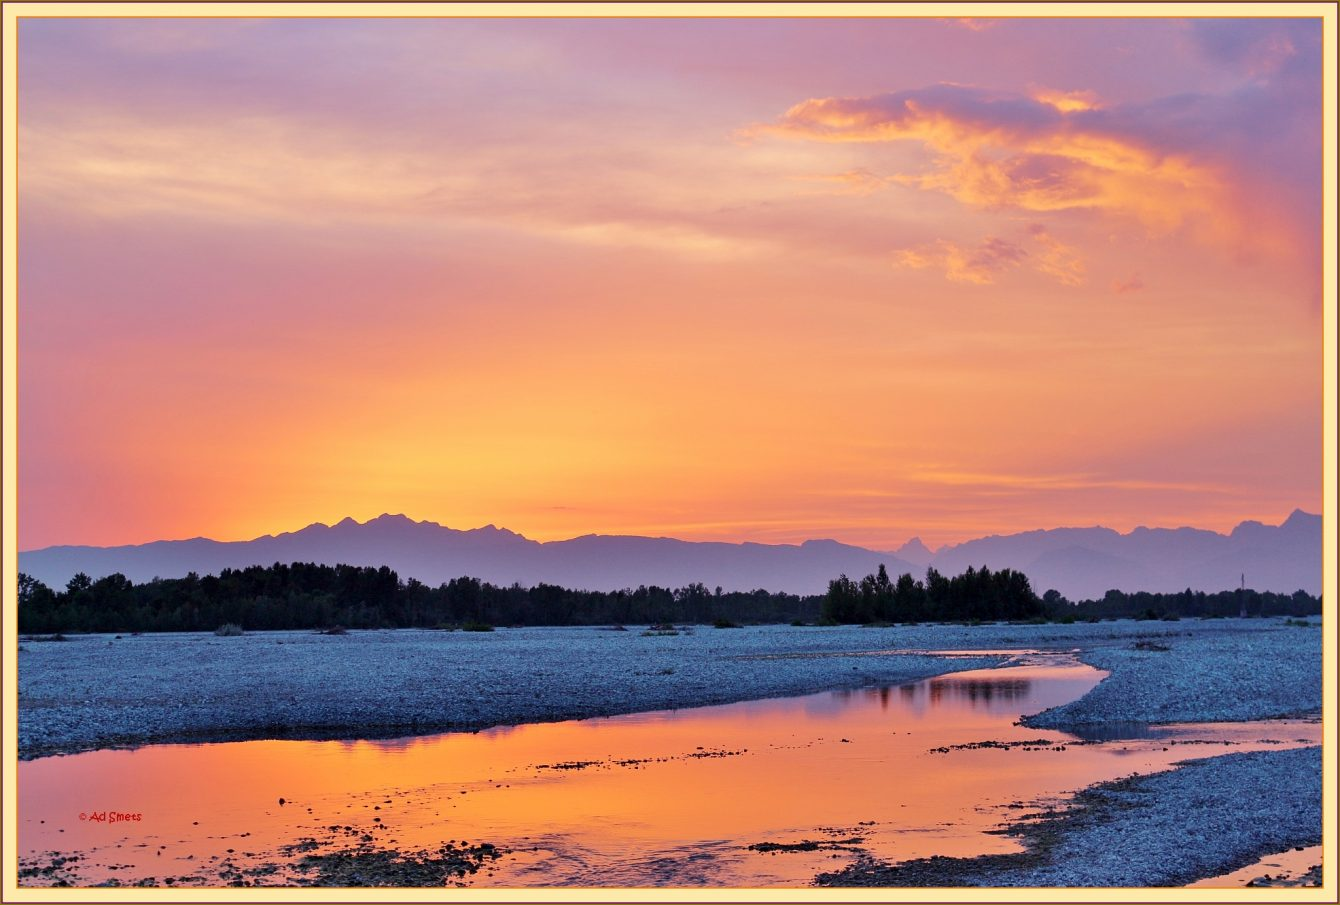 il-tramonto_foto-ad-smets_1404-kopie